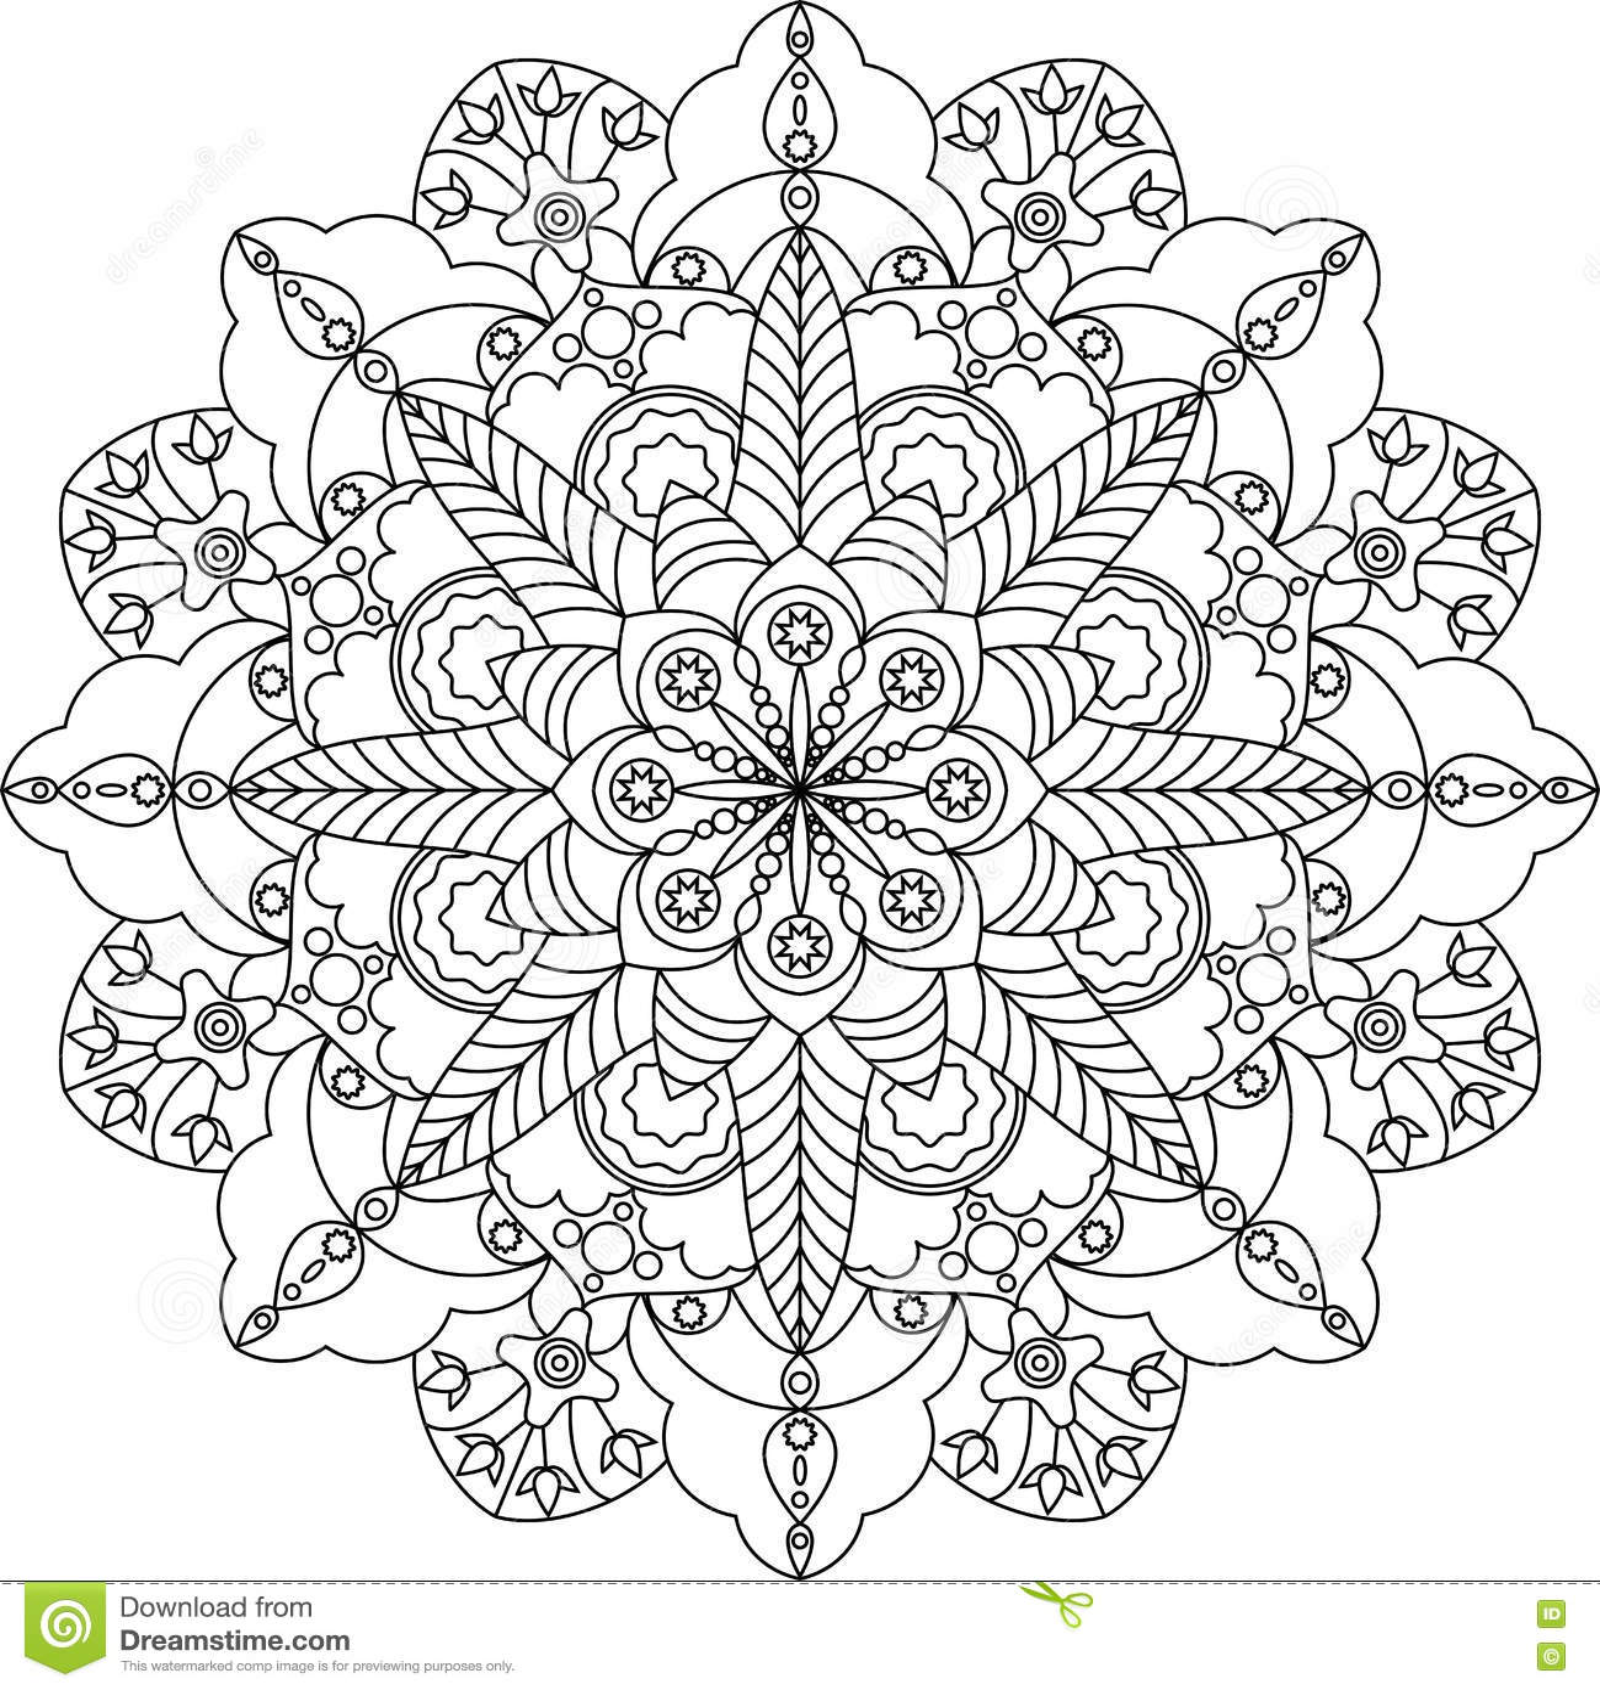 Erwachsene Farbtonseite Zentangle, Mandala Mit Blumen Vektor ...